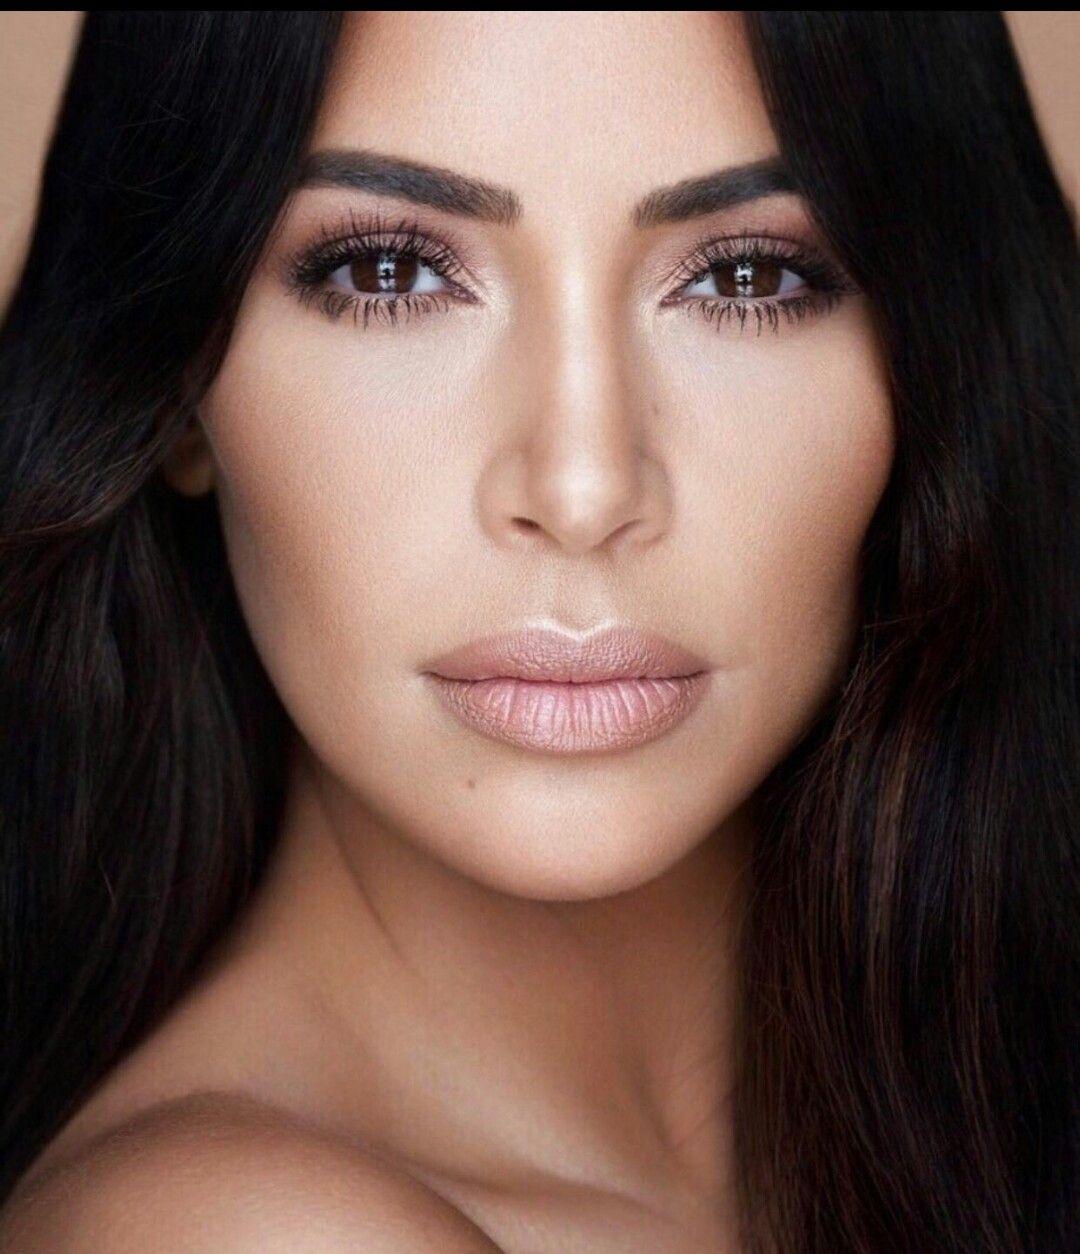 Kim kardashian kim k west pinterest kardashian kim kadashian